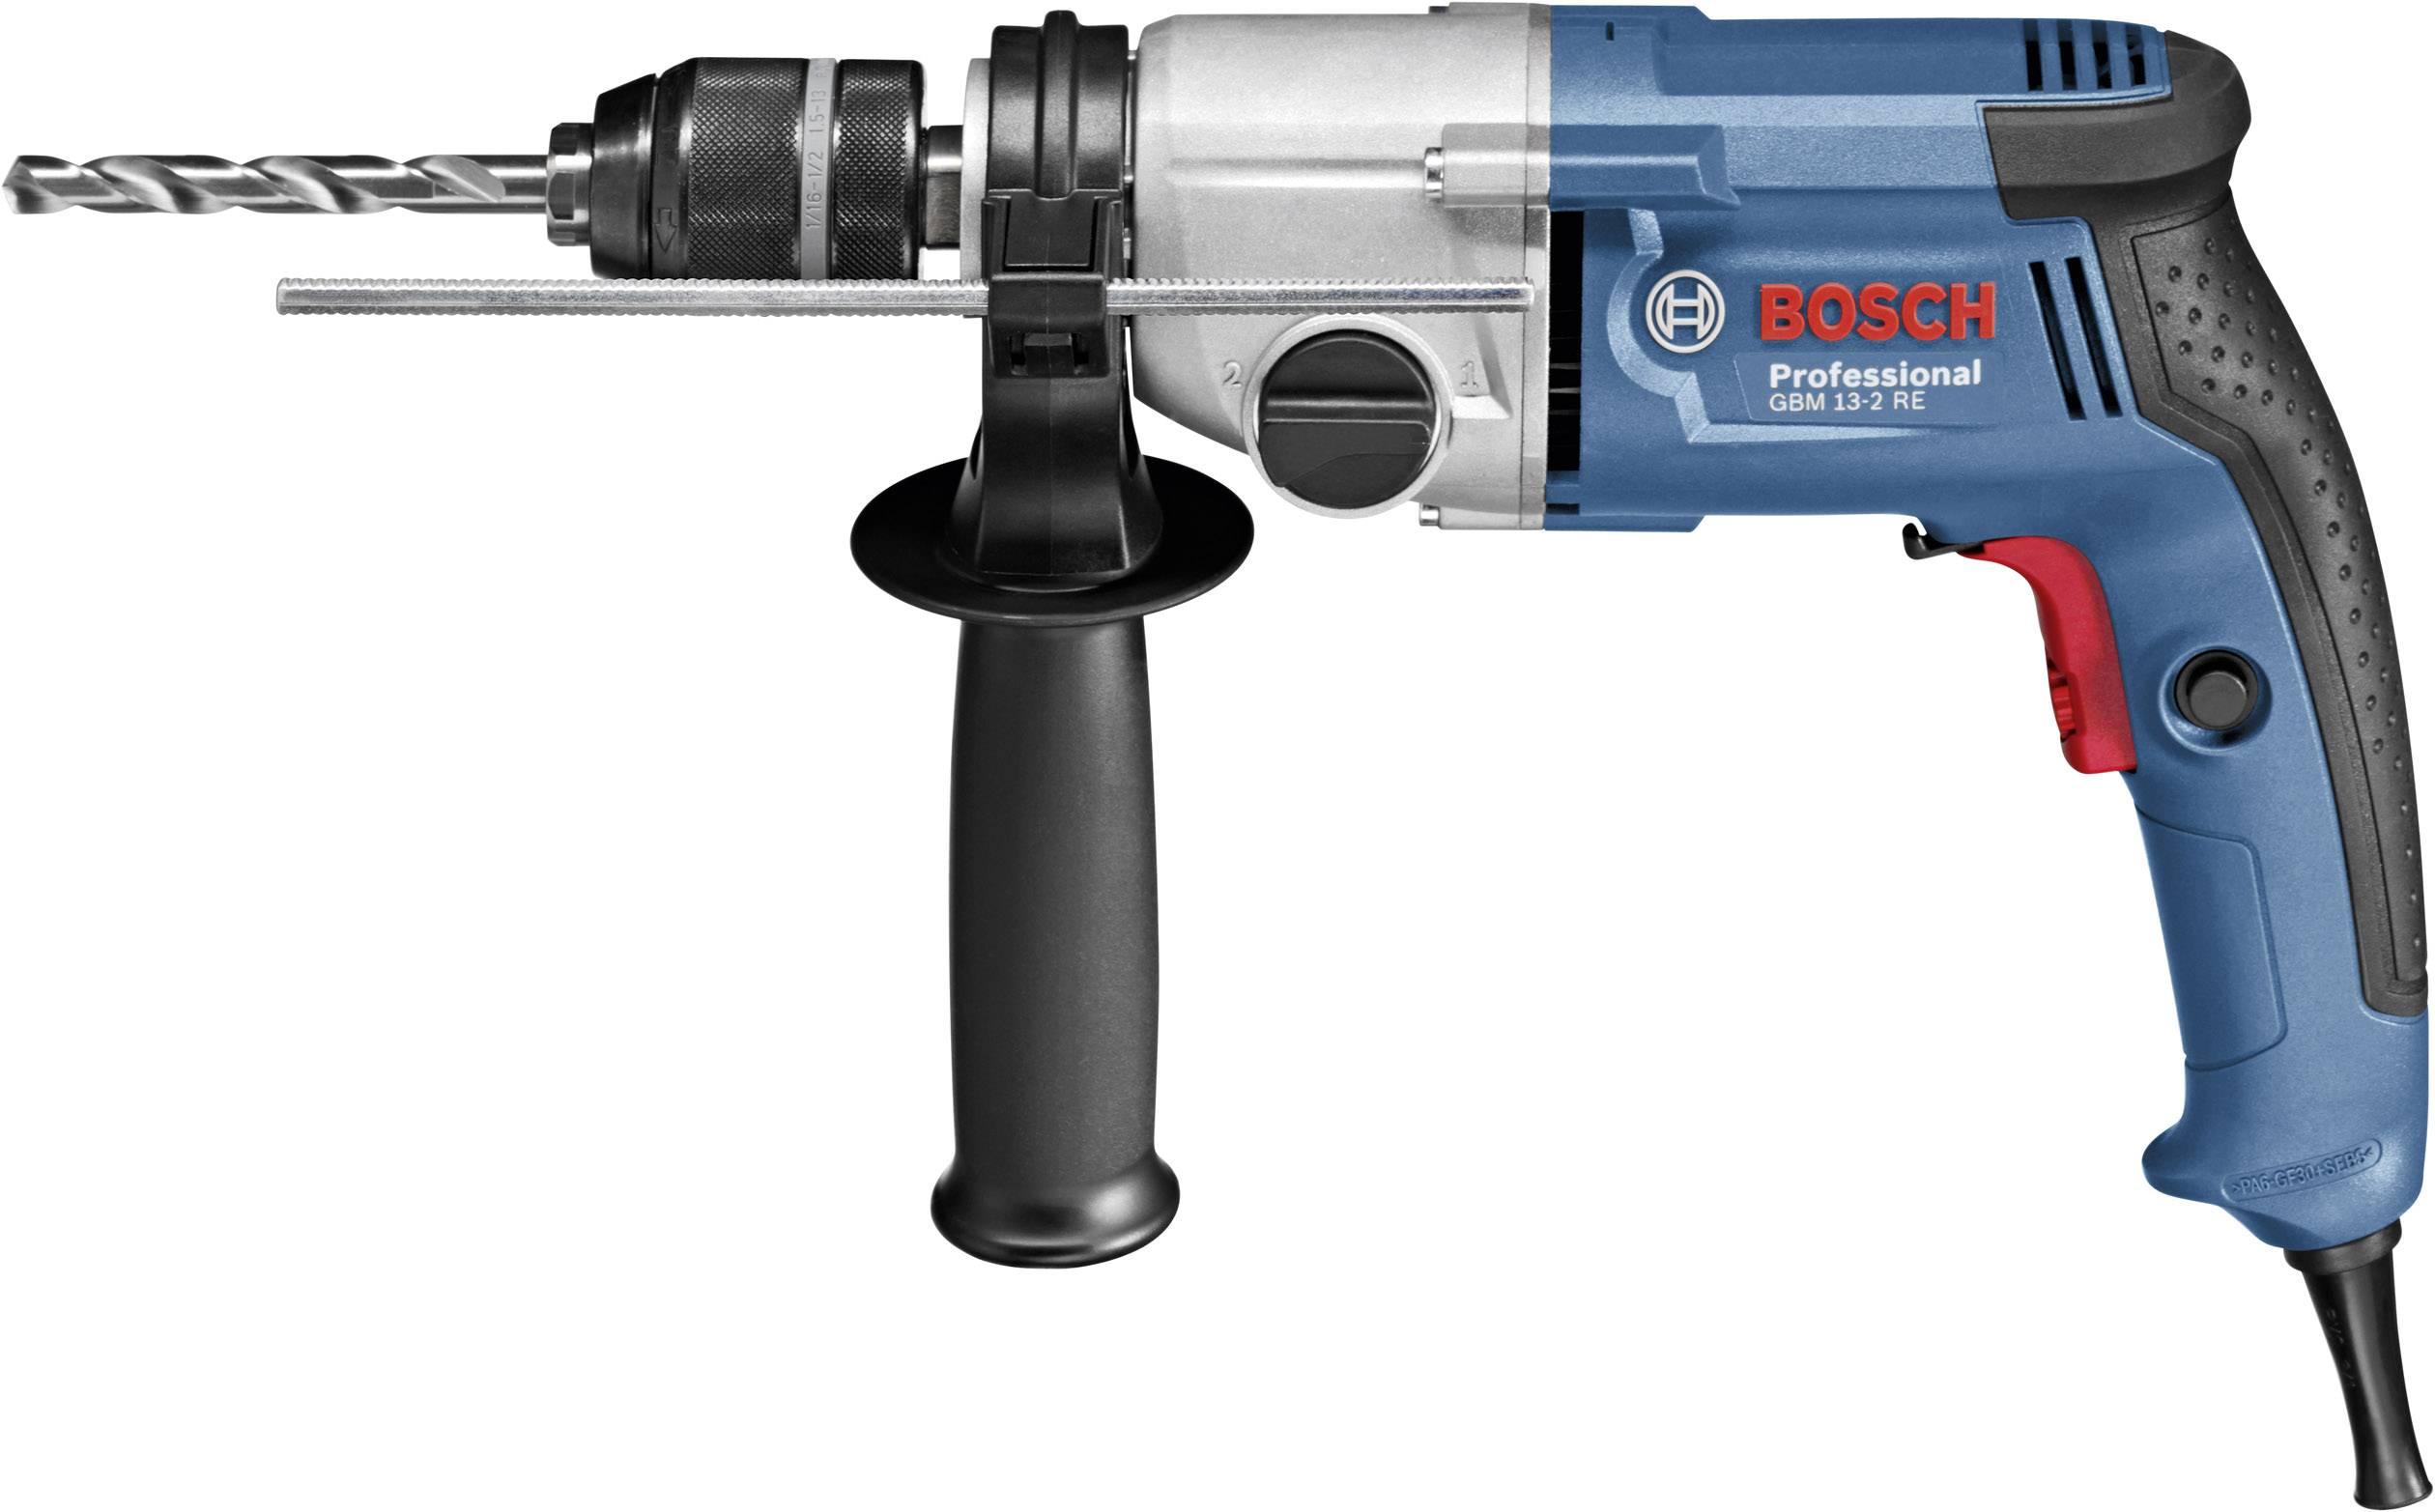 Wundervoll Bosch Professional GBM 13-2 RE -Bohrmaschine online kaufen » conrad.de BG69